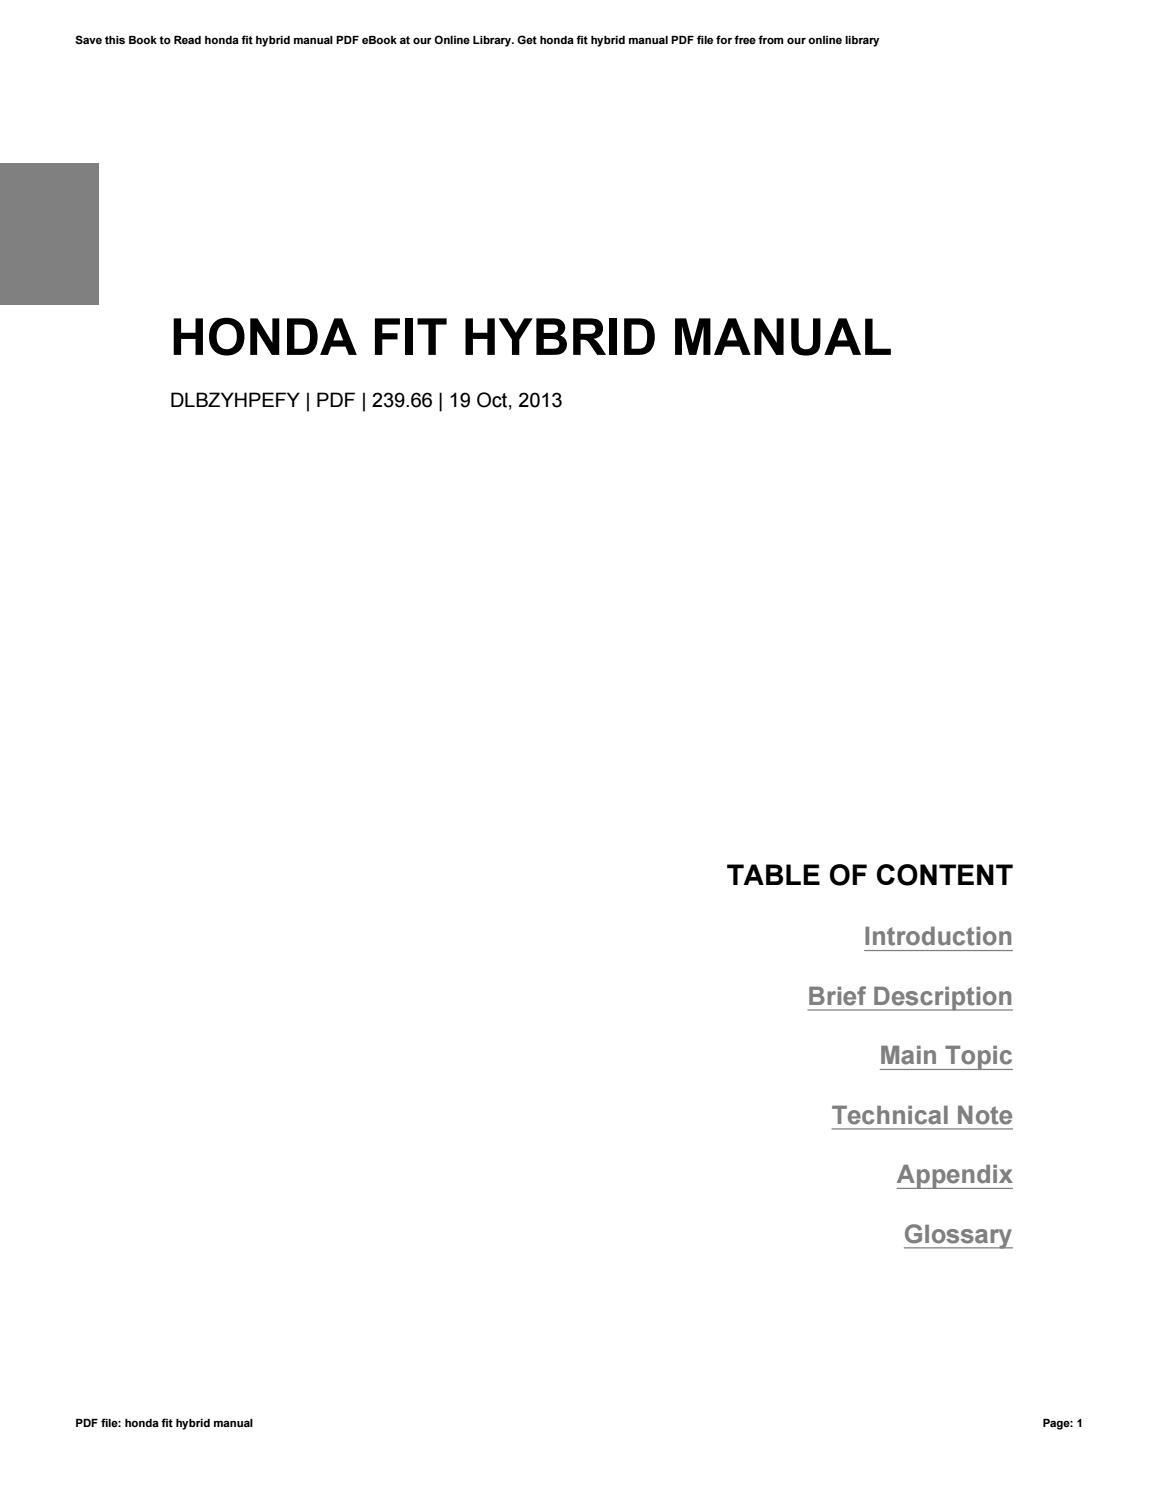 Honda Fit Hybrid Manual By Dorahill4842 Manual Guide